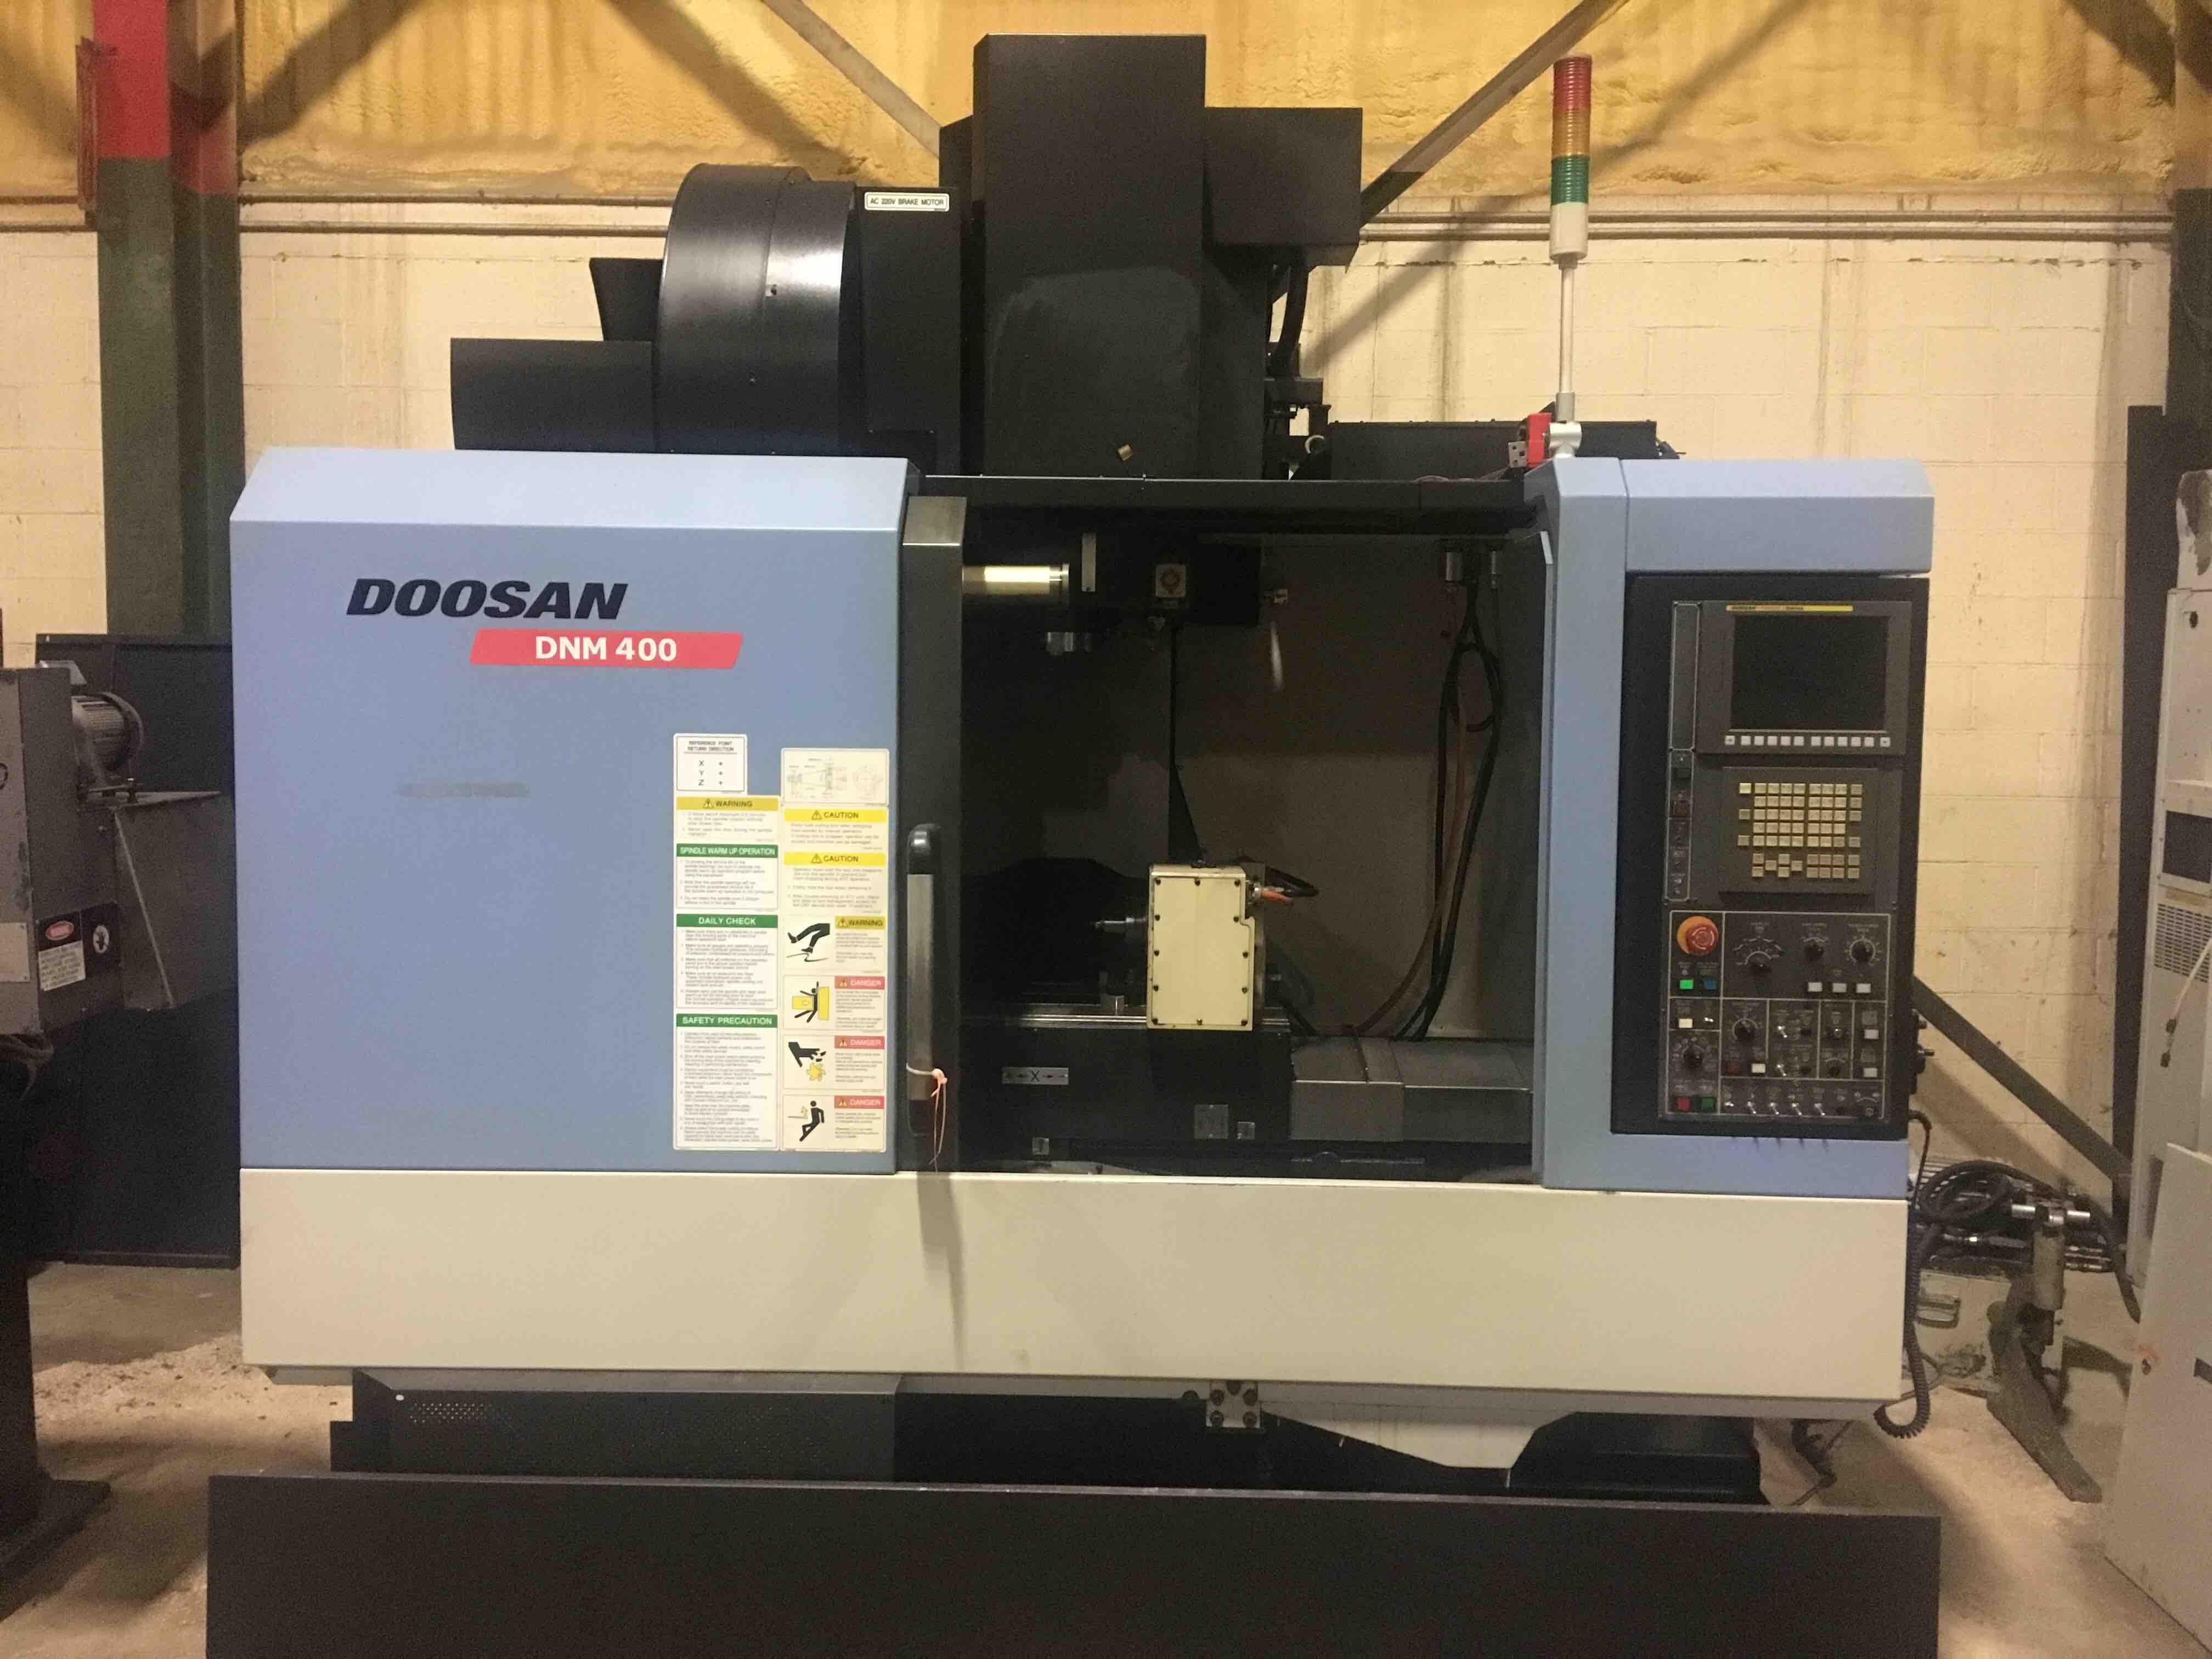 Doosan DNM-400 CNC Vertical Machining Center, Fanuc Series i, 30